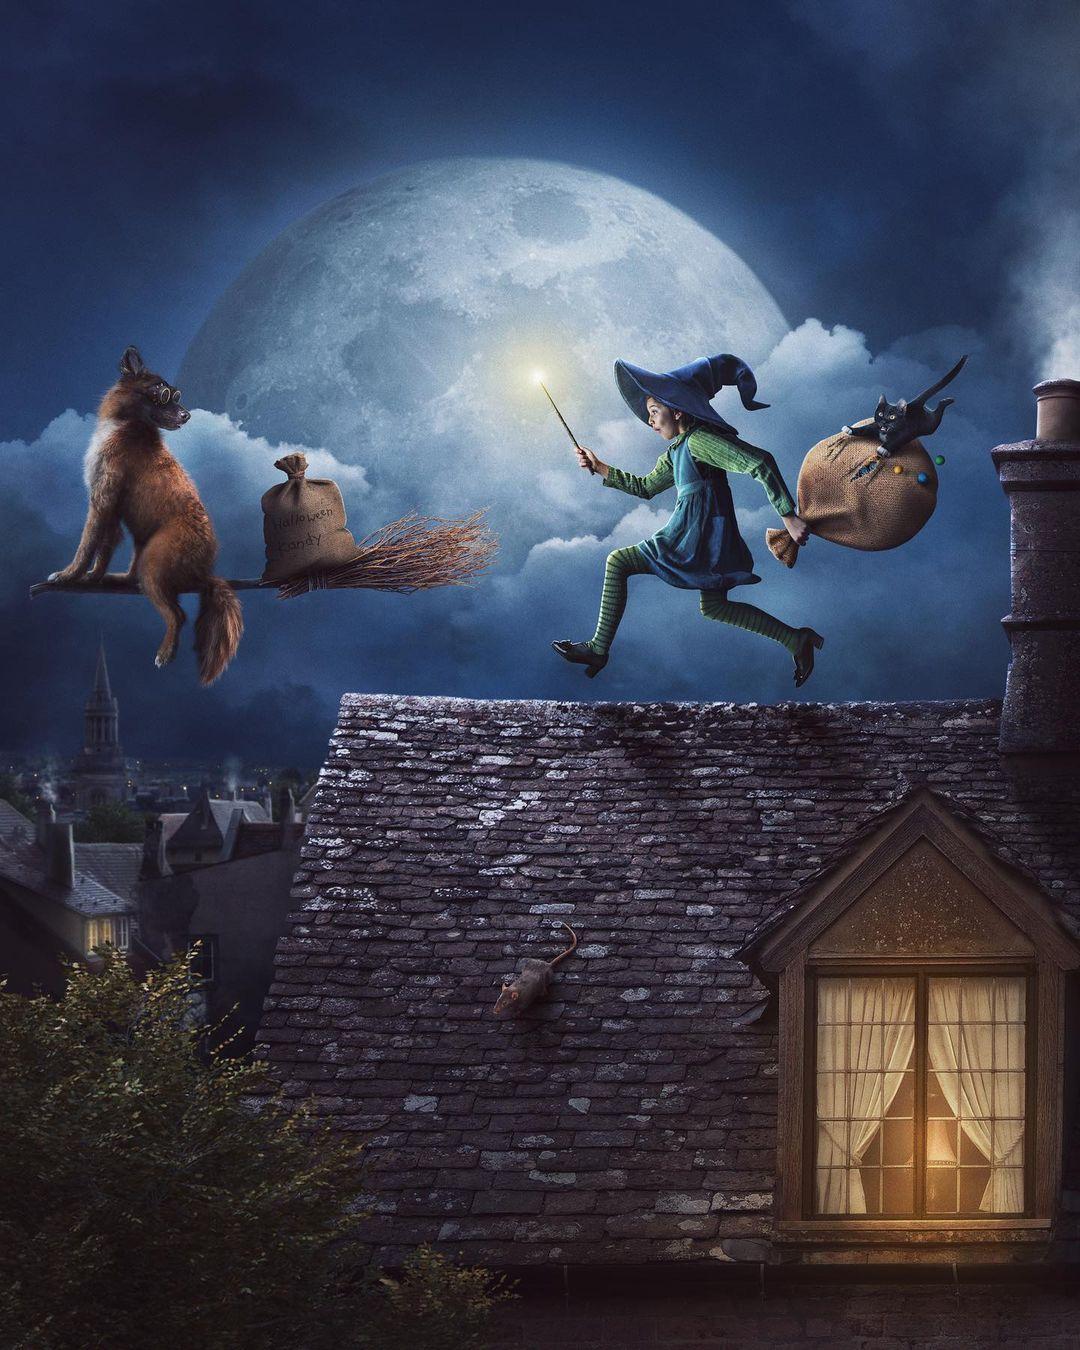 surreal photomanipulation stealing christmas by vanessa rivera